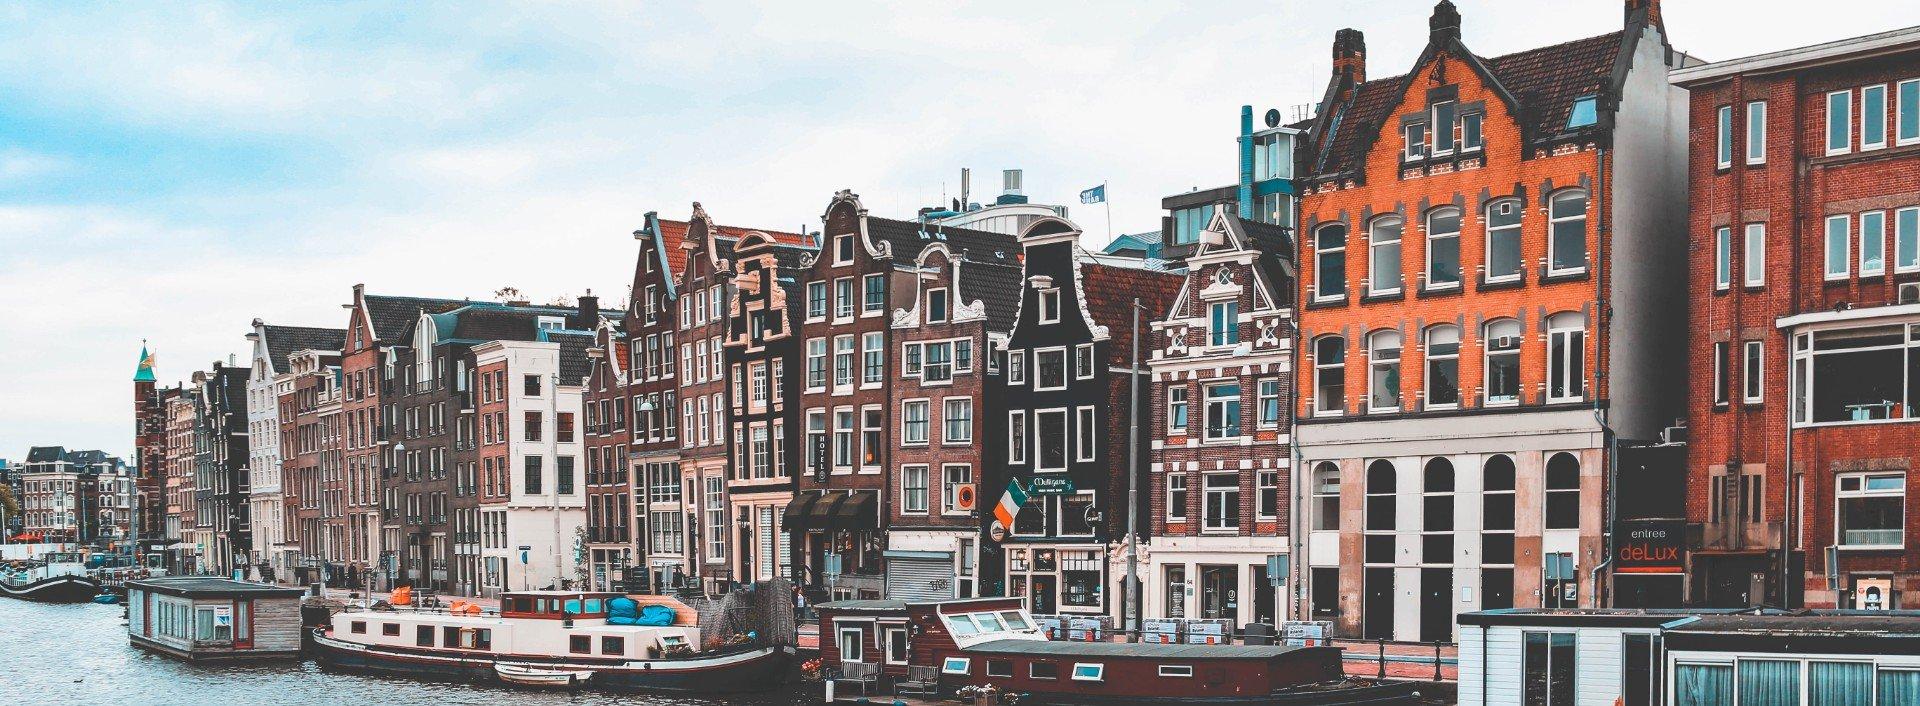 A row of dutch houses along a river : Dutch loan words